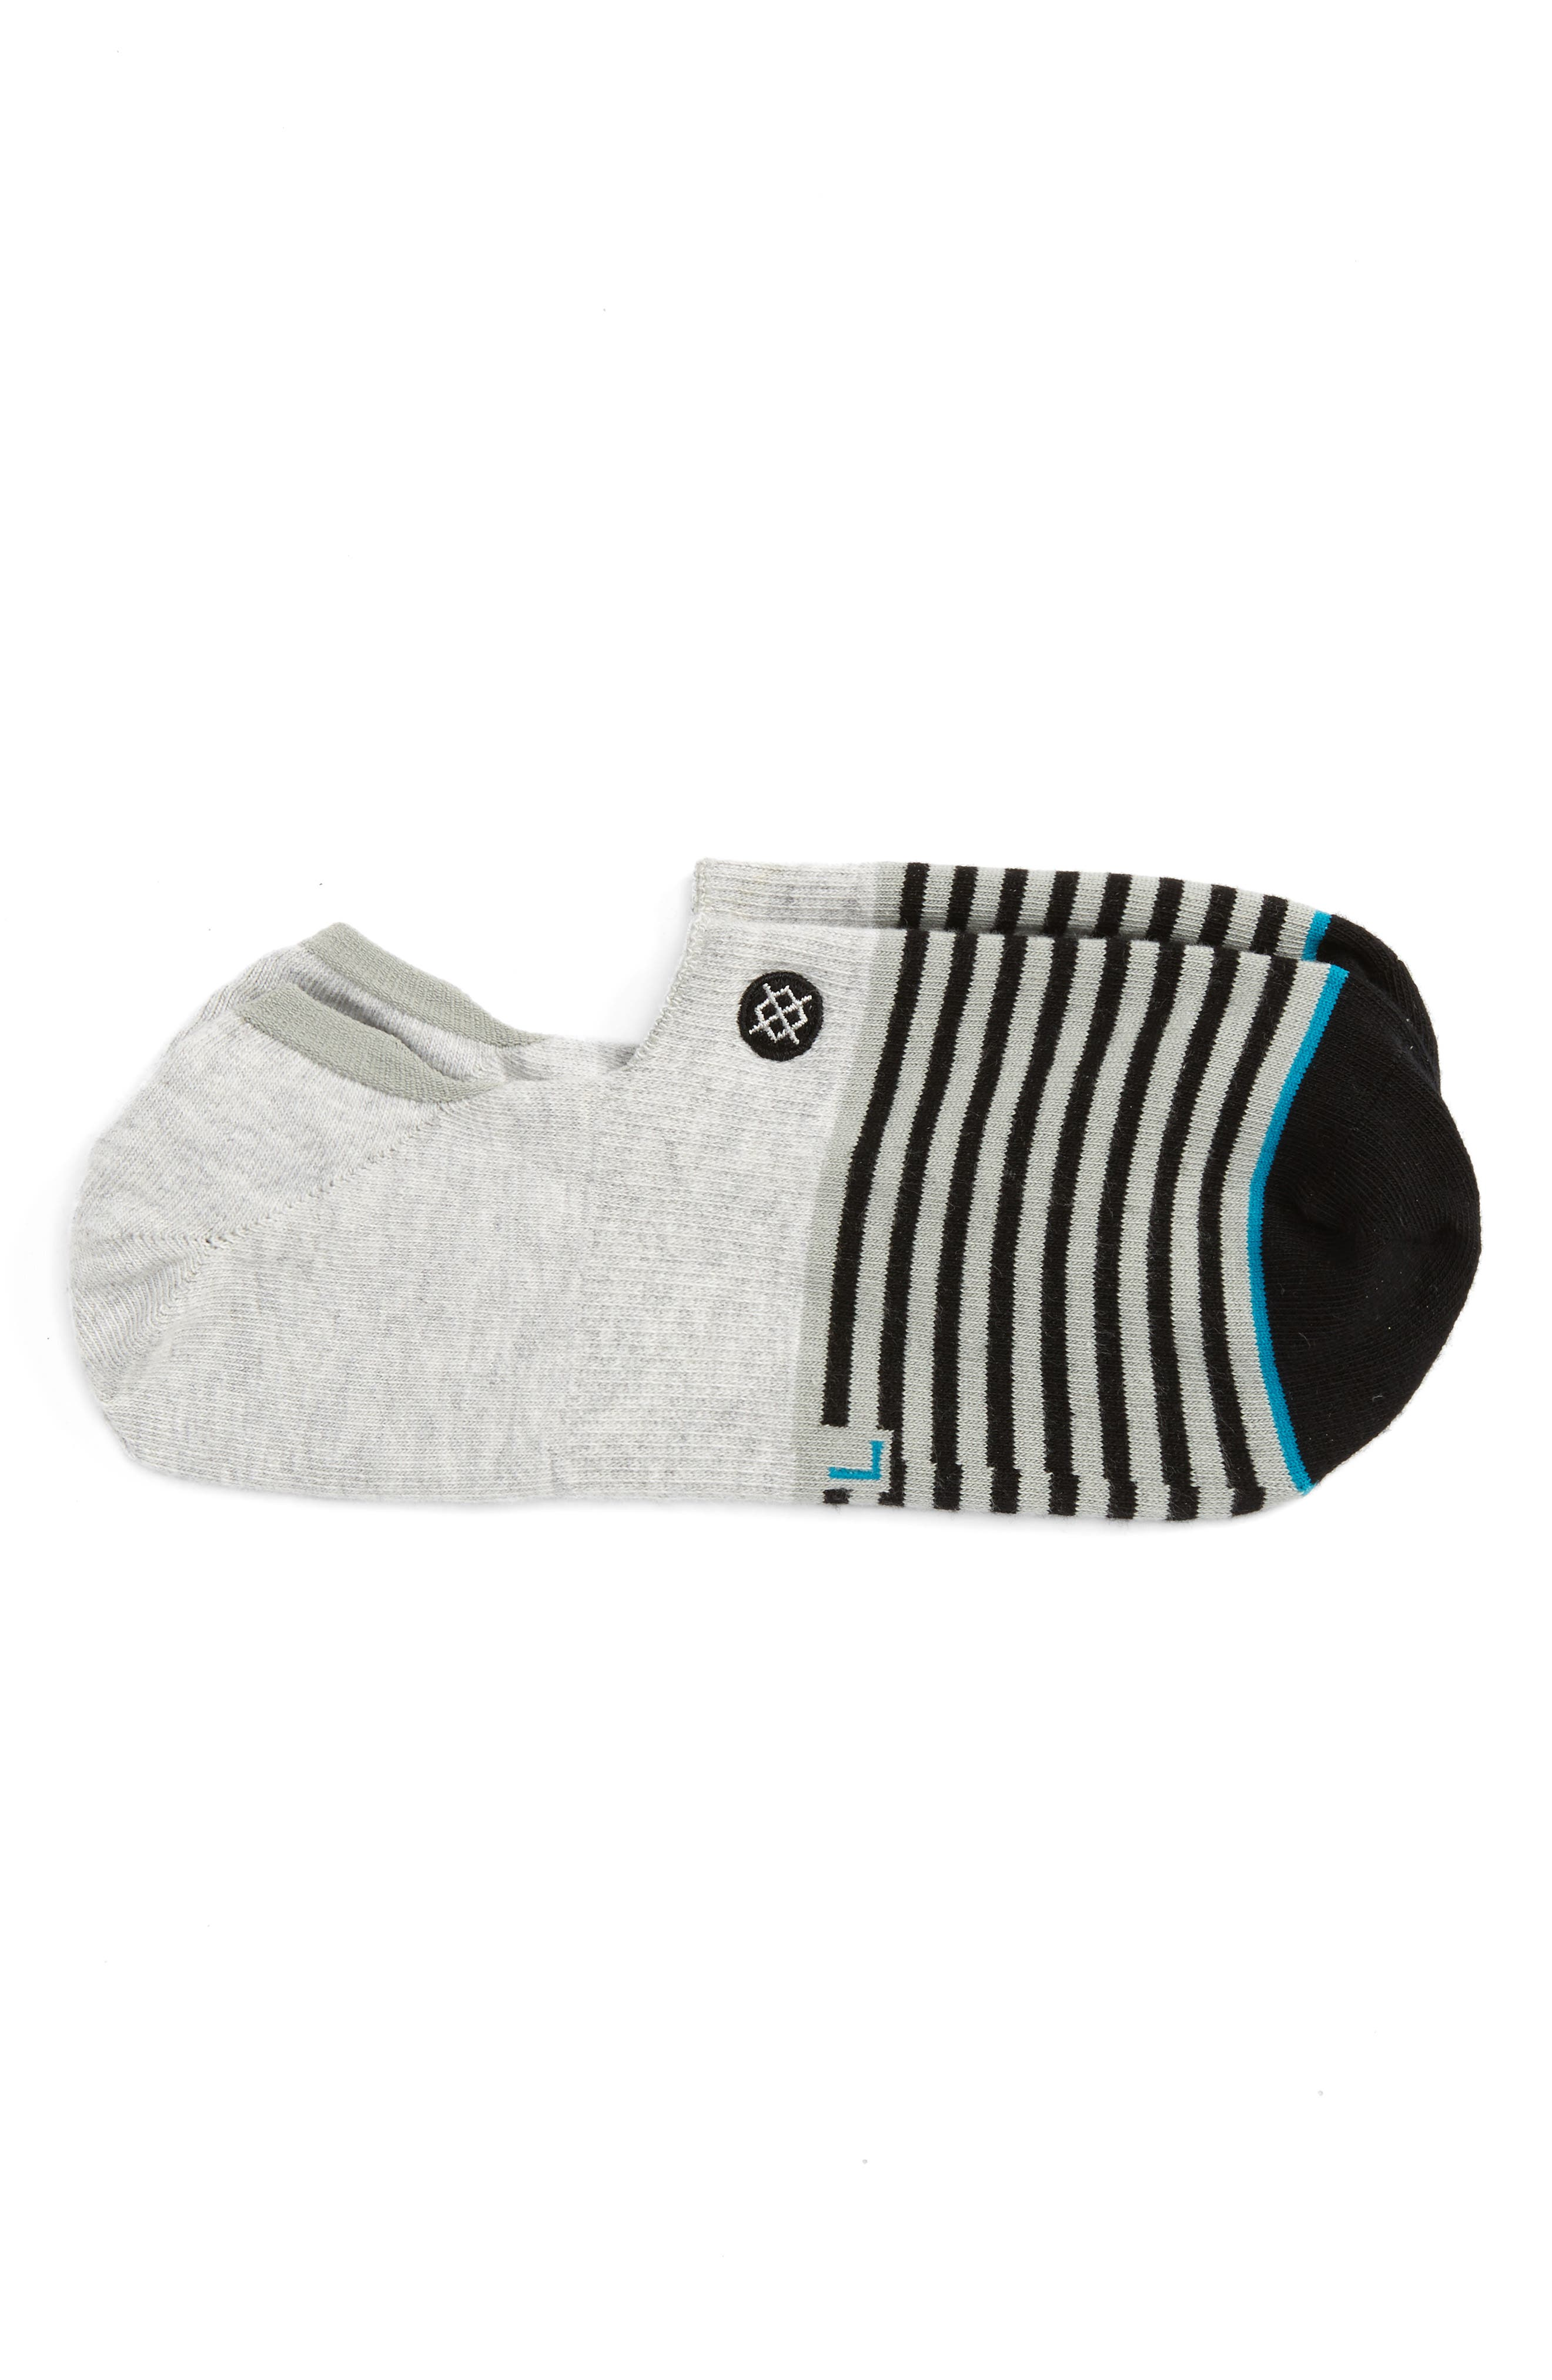 Alternate Image 1 Selected - Stance Nagano Striped No-Show Socks